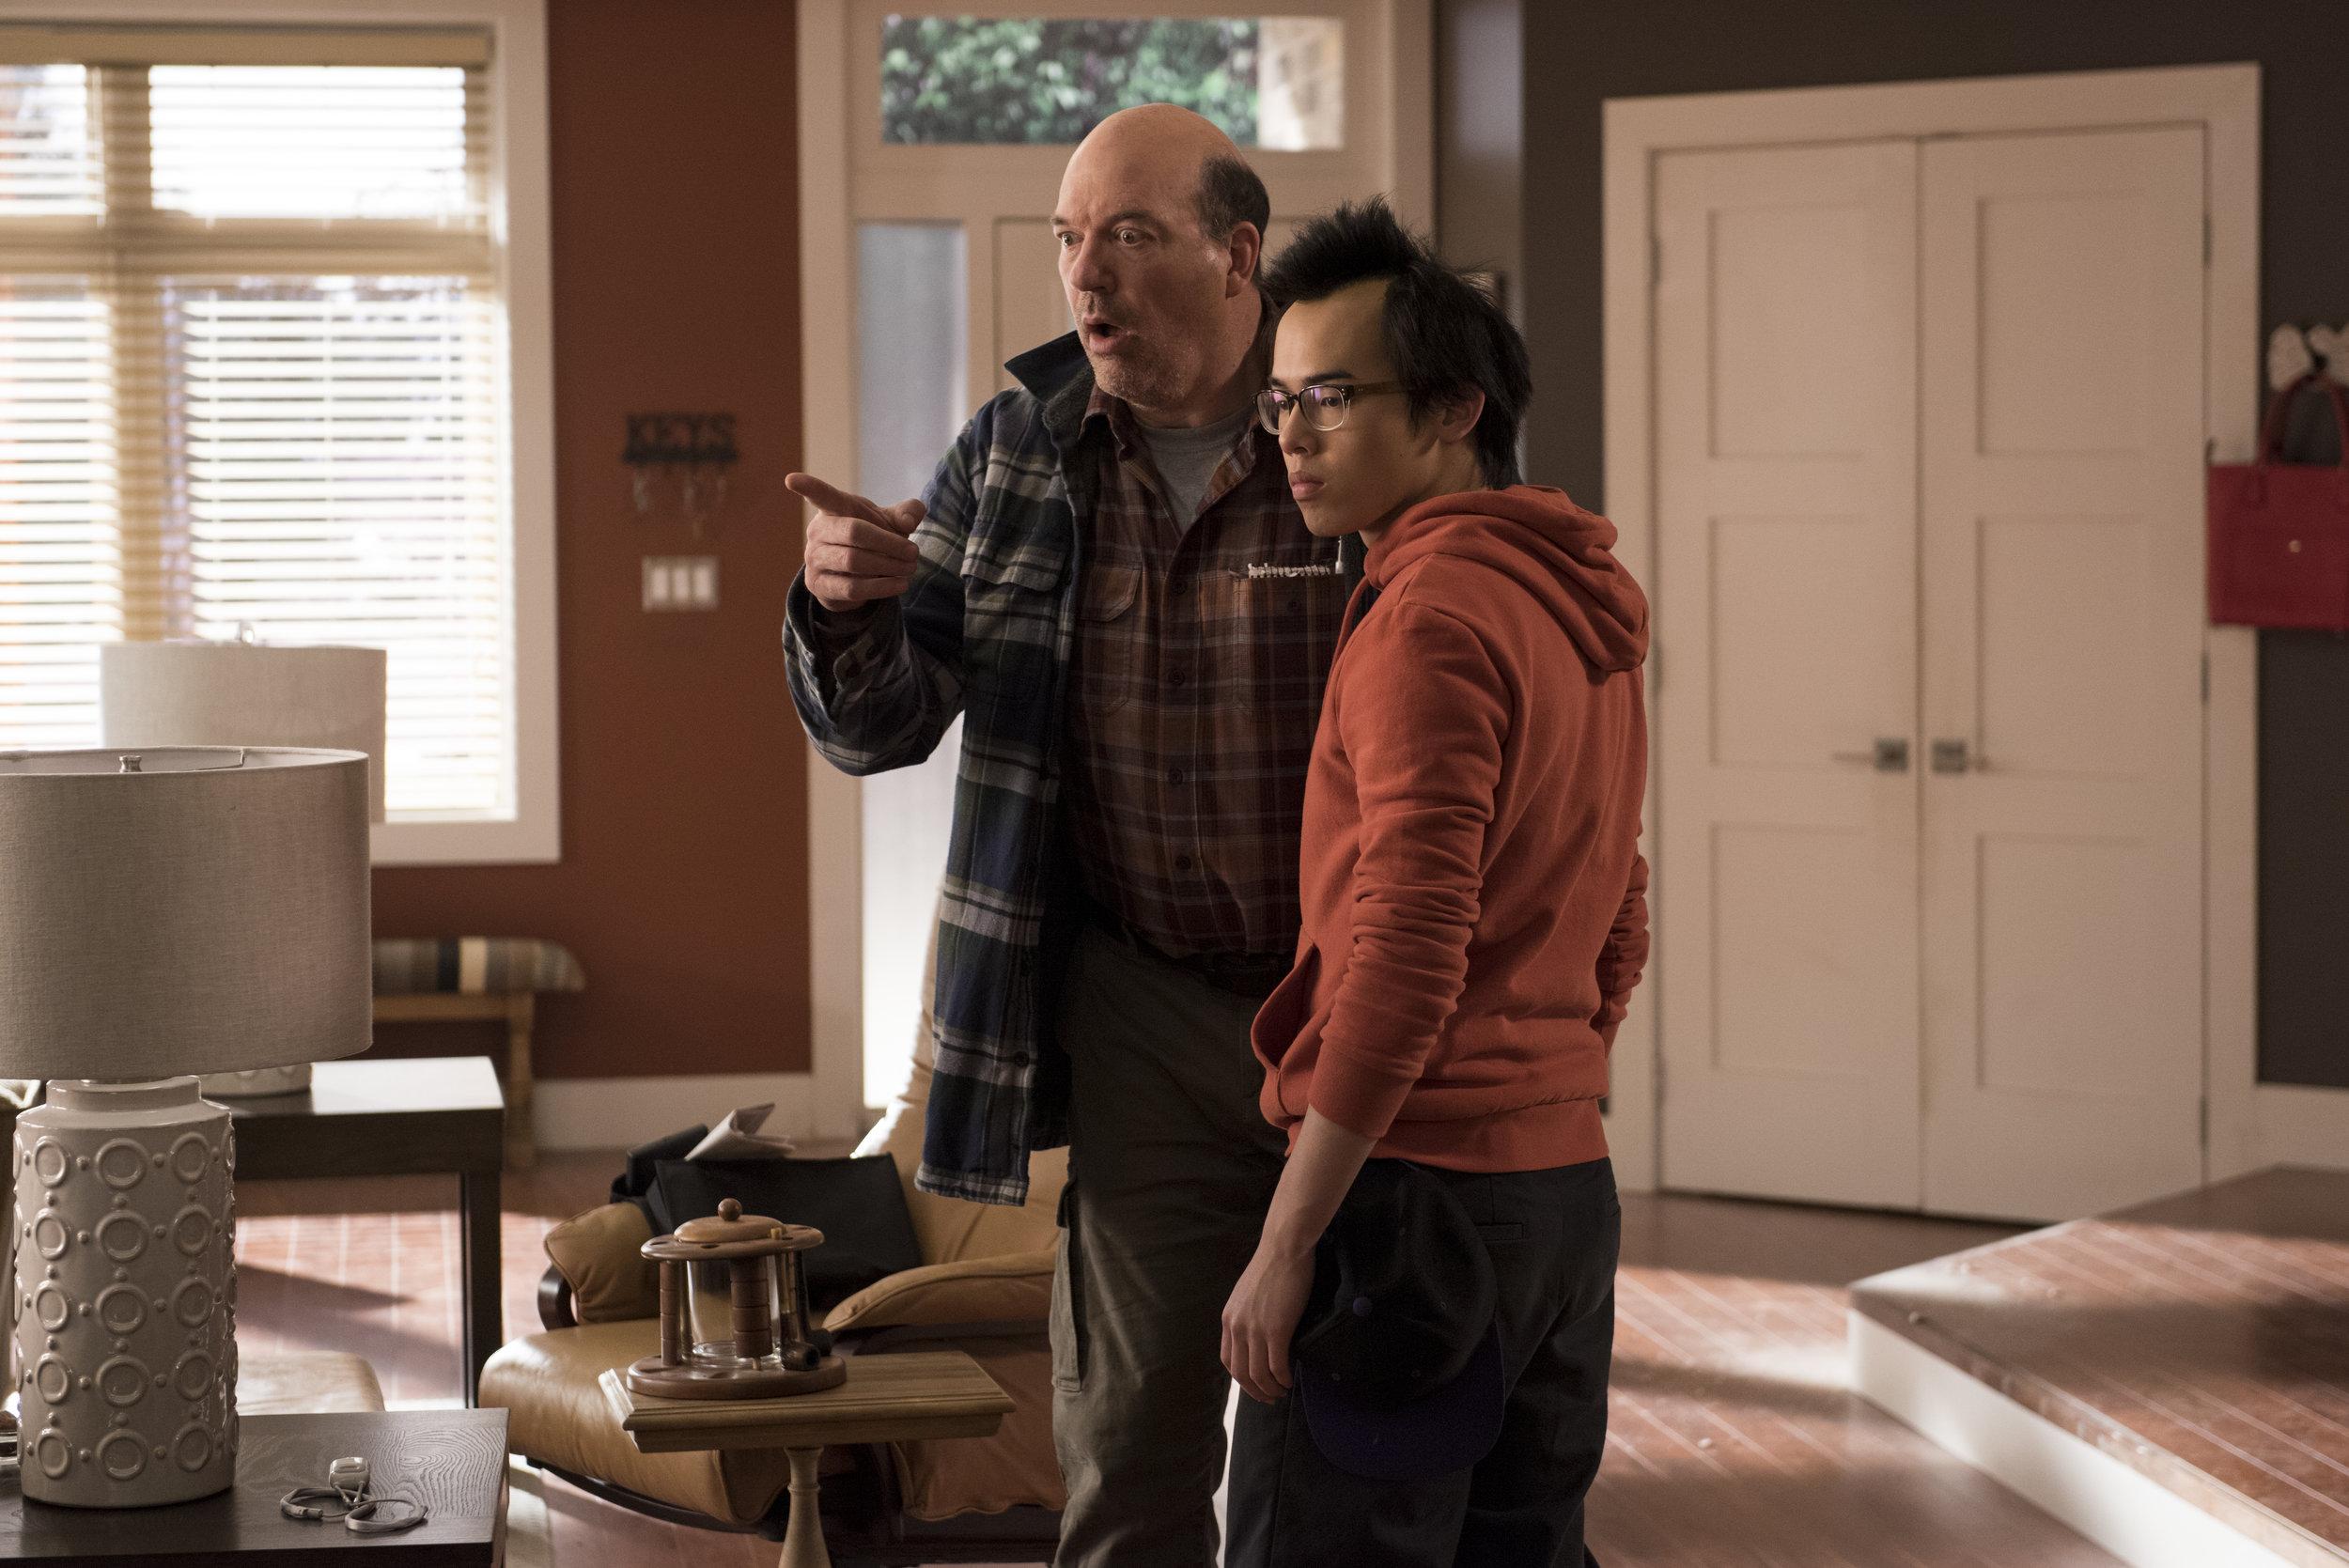 John Carroll Lynch as Owen and Daniel Davis Yang as Brian. Courtesy of CBC (Photo Credit: Christos Kalohoridis)